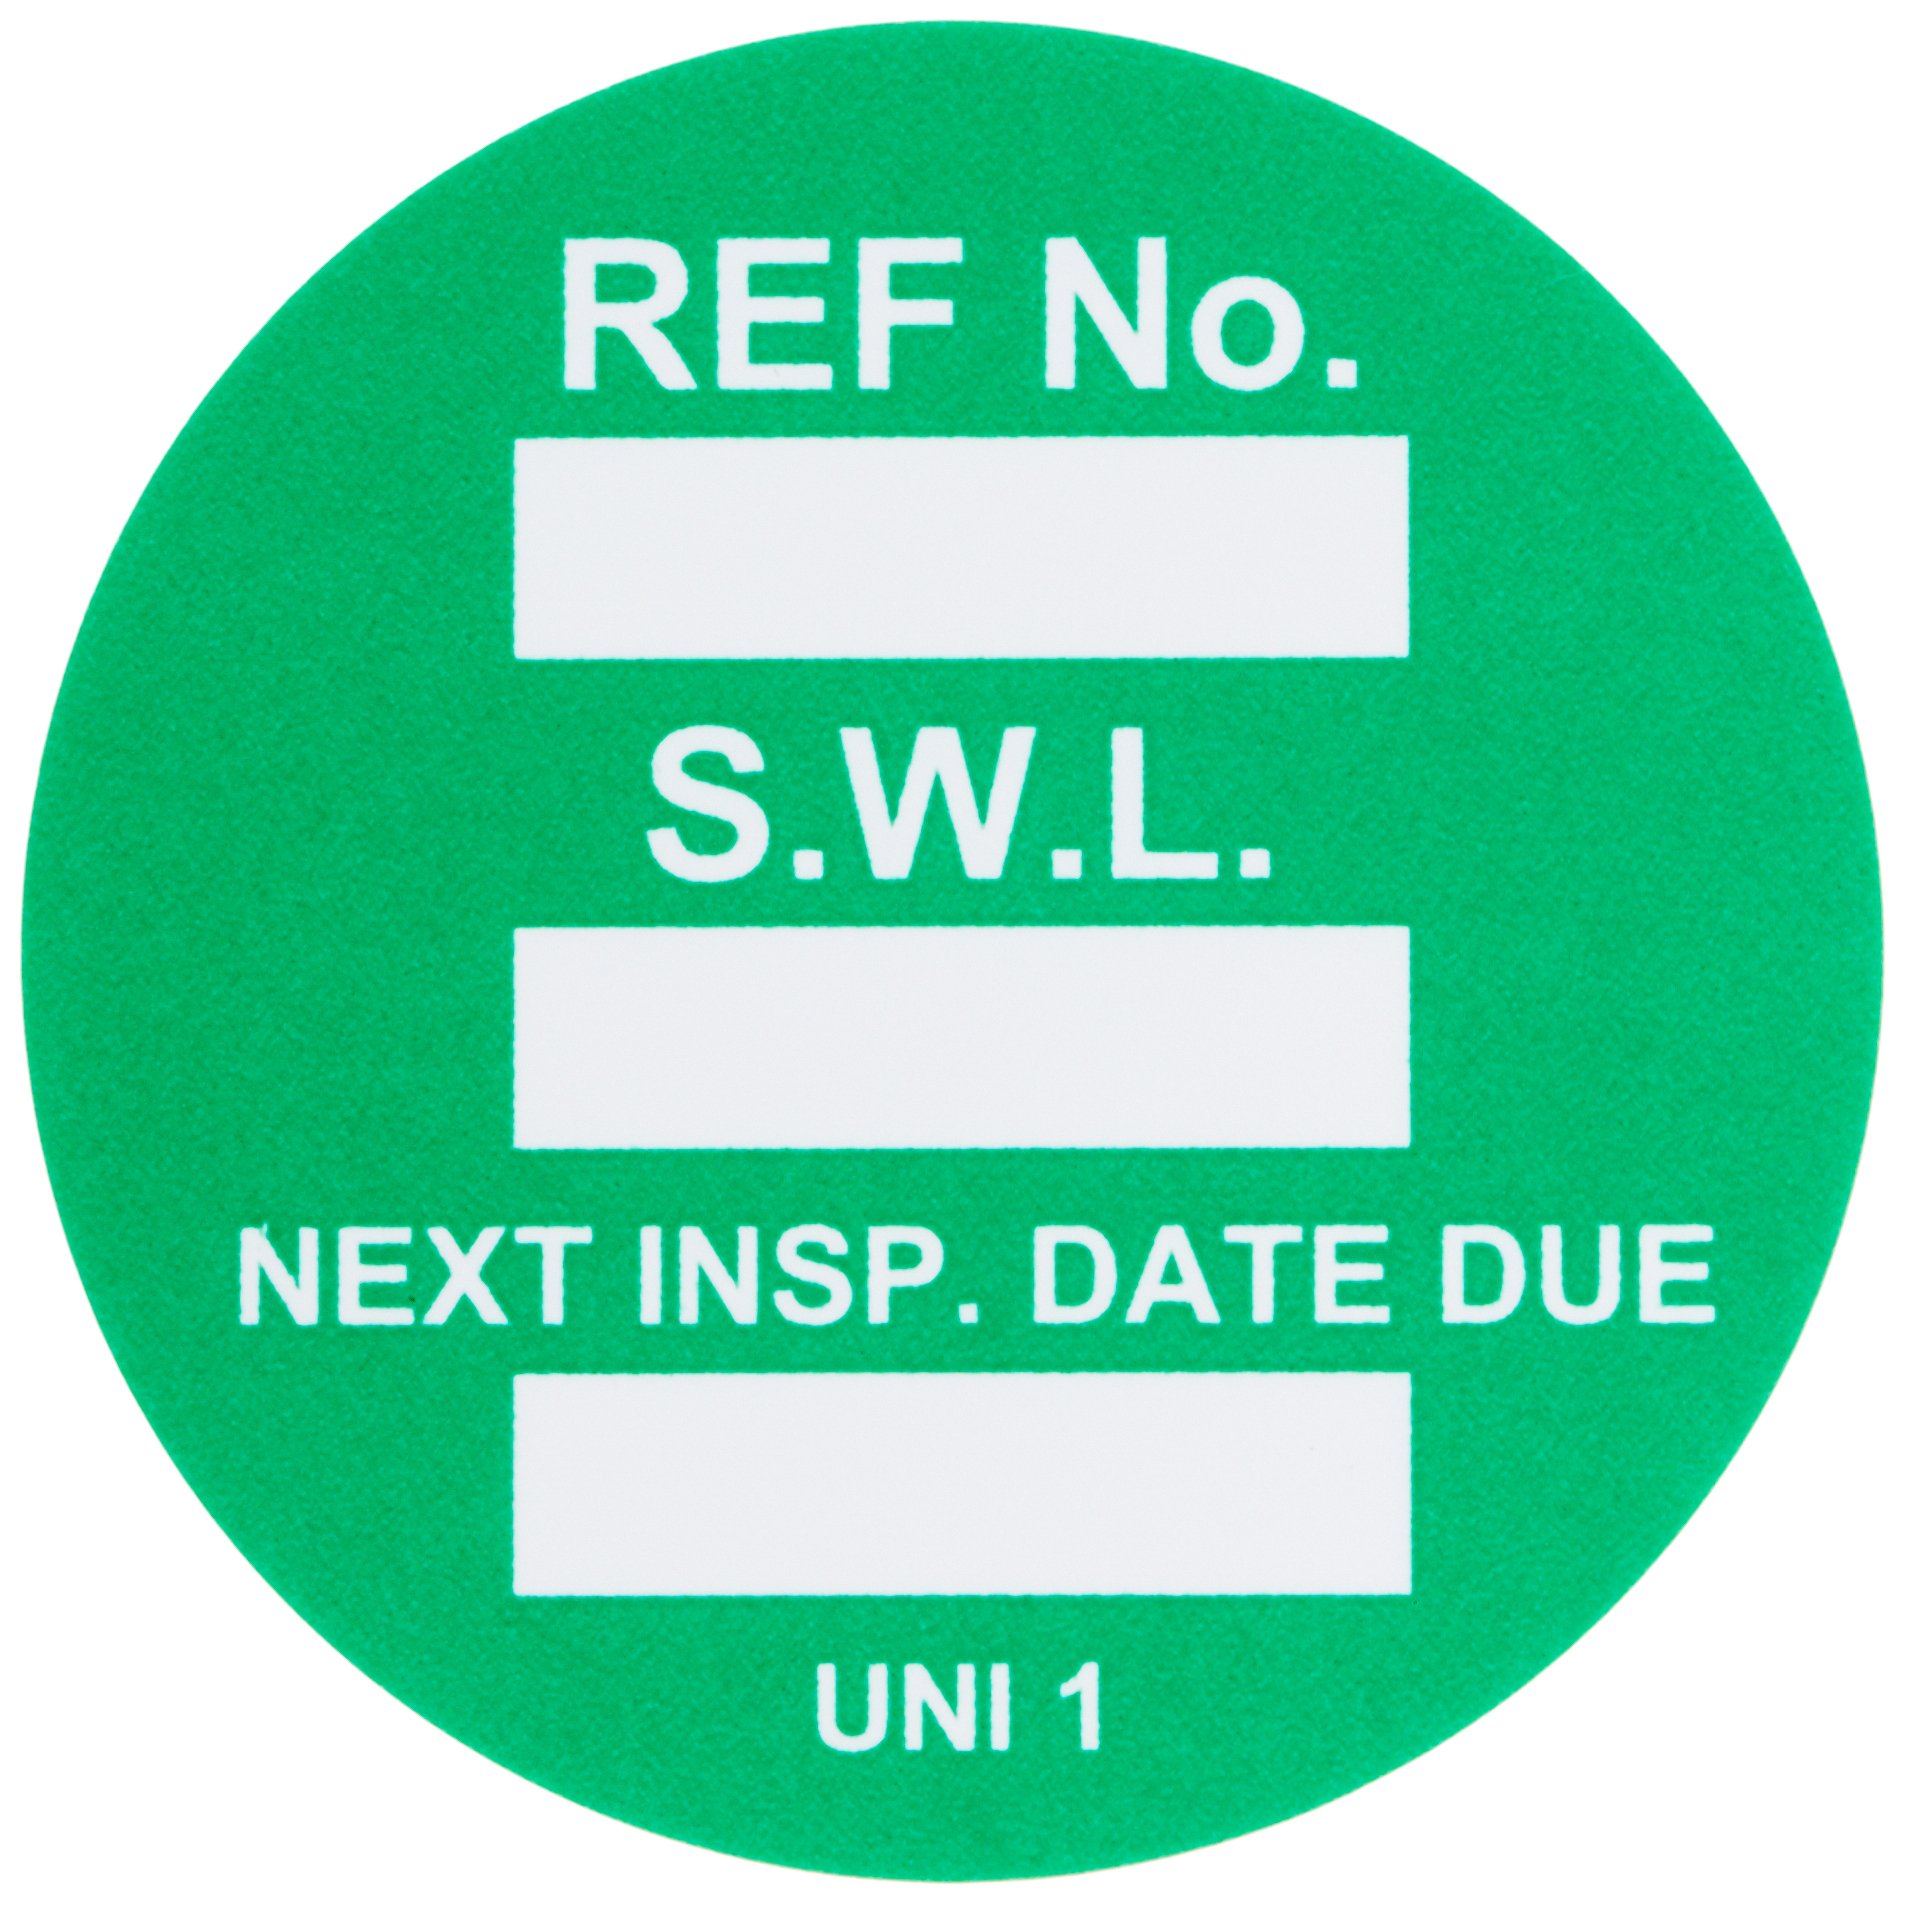 Brady UNI-UNI GREEN, Green Universal Tag INSERTS SAFE WORK LOAD 100/Package GRN (100 Tags)